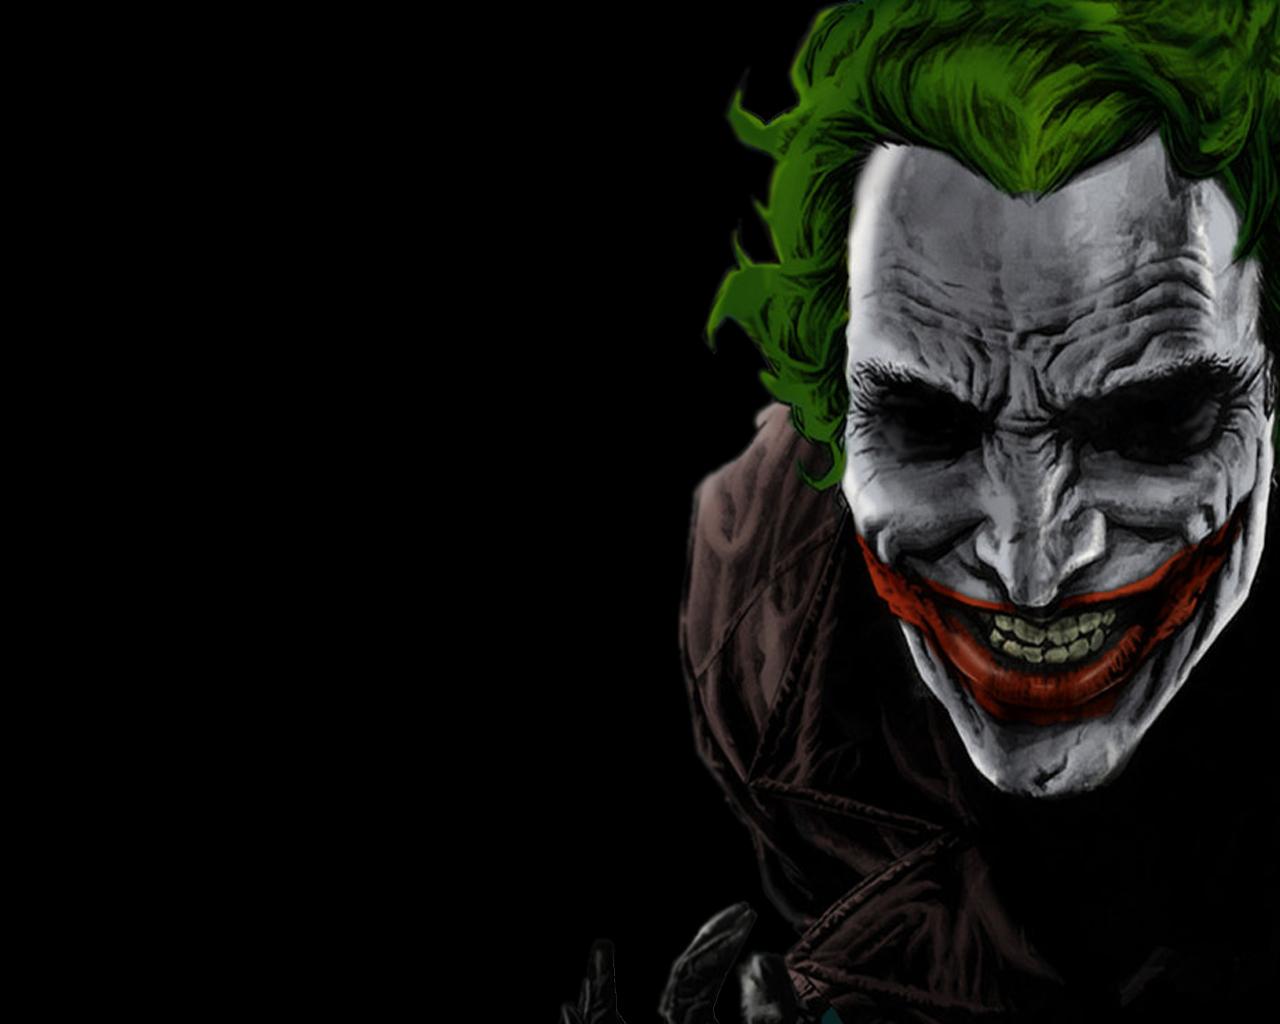 joker   The Joker Wallpaper 32586037   Page 2 1280x1024